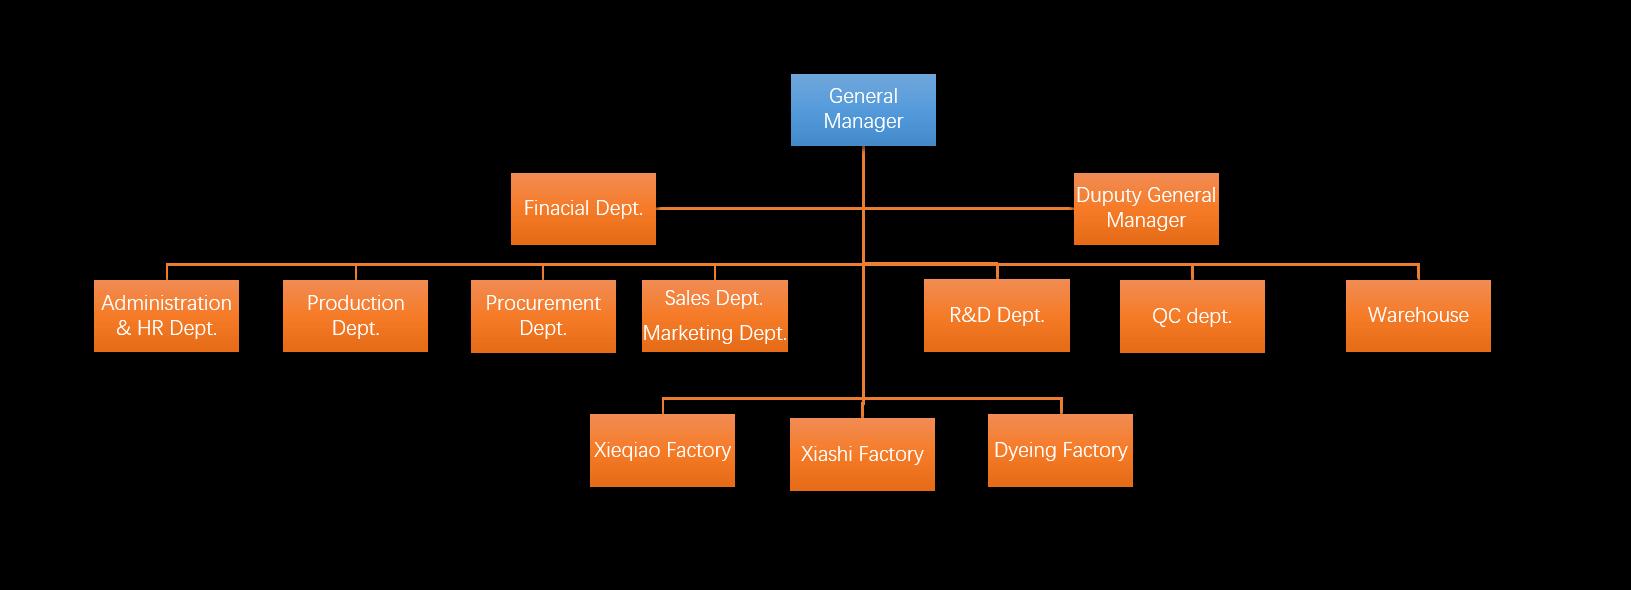 hongyi warp organization